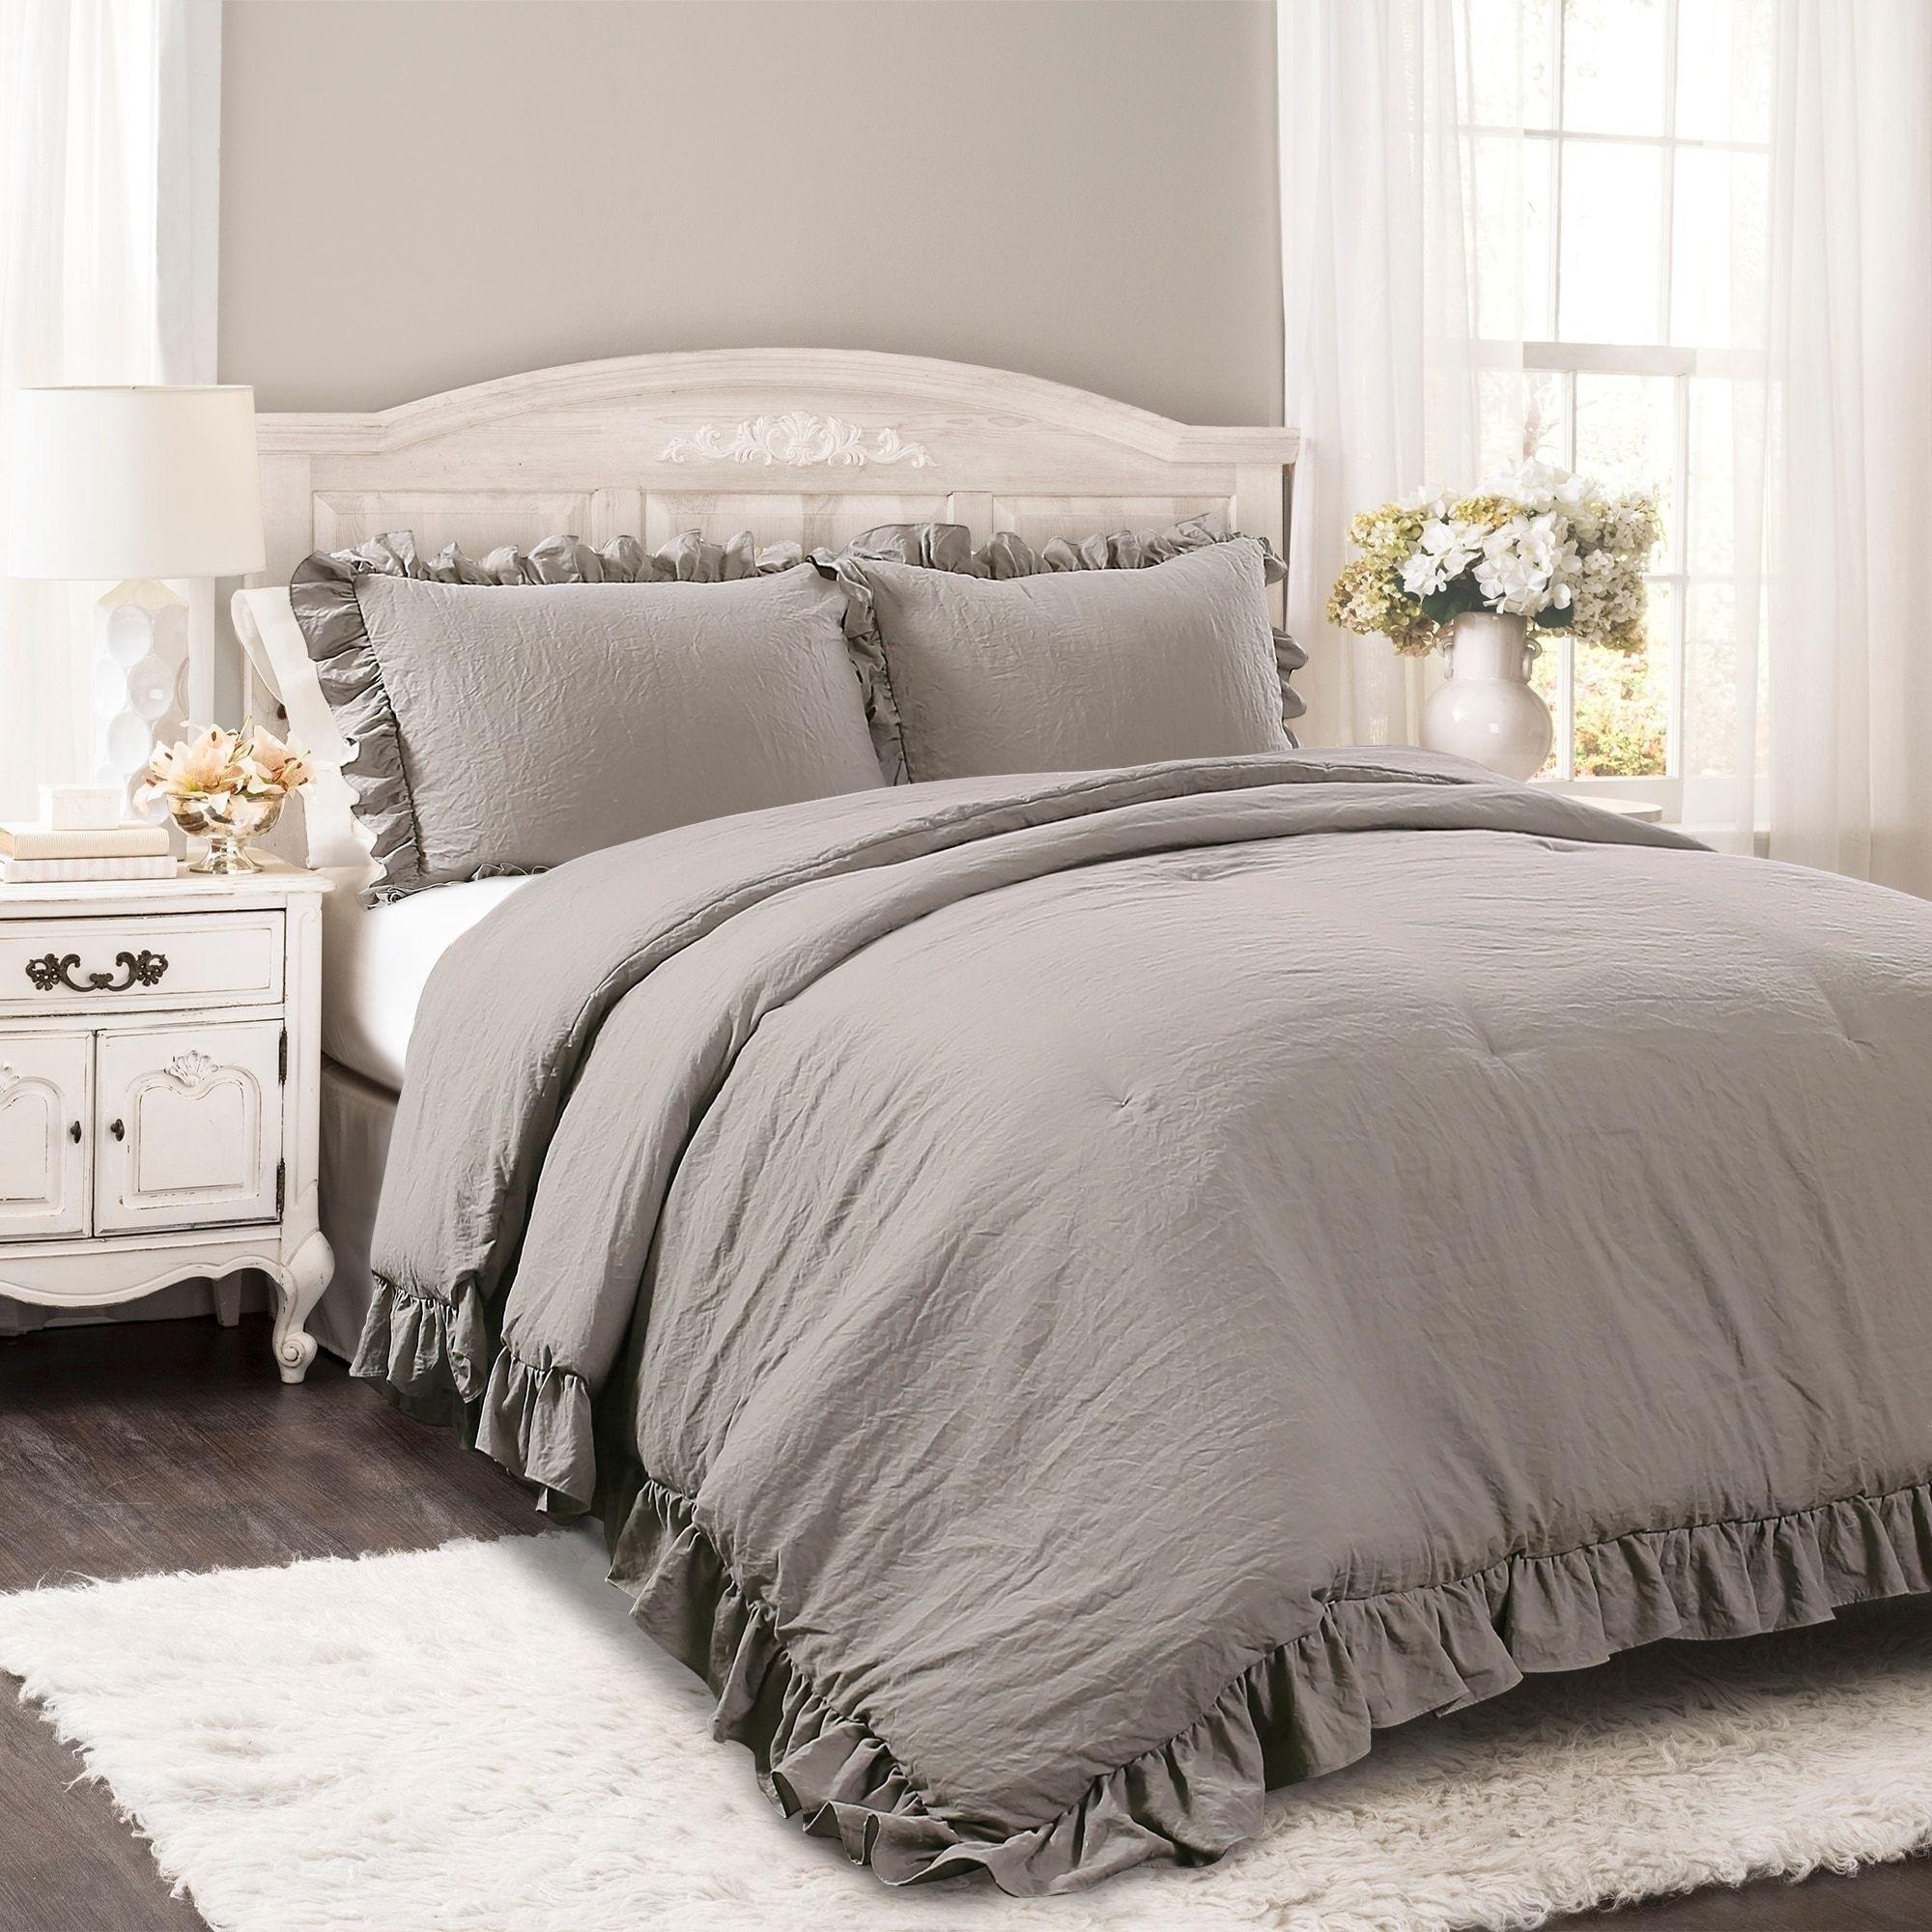 Lush Decor Reyna 3 Piece Comforter Set Comforter Sets Grey